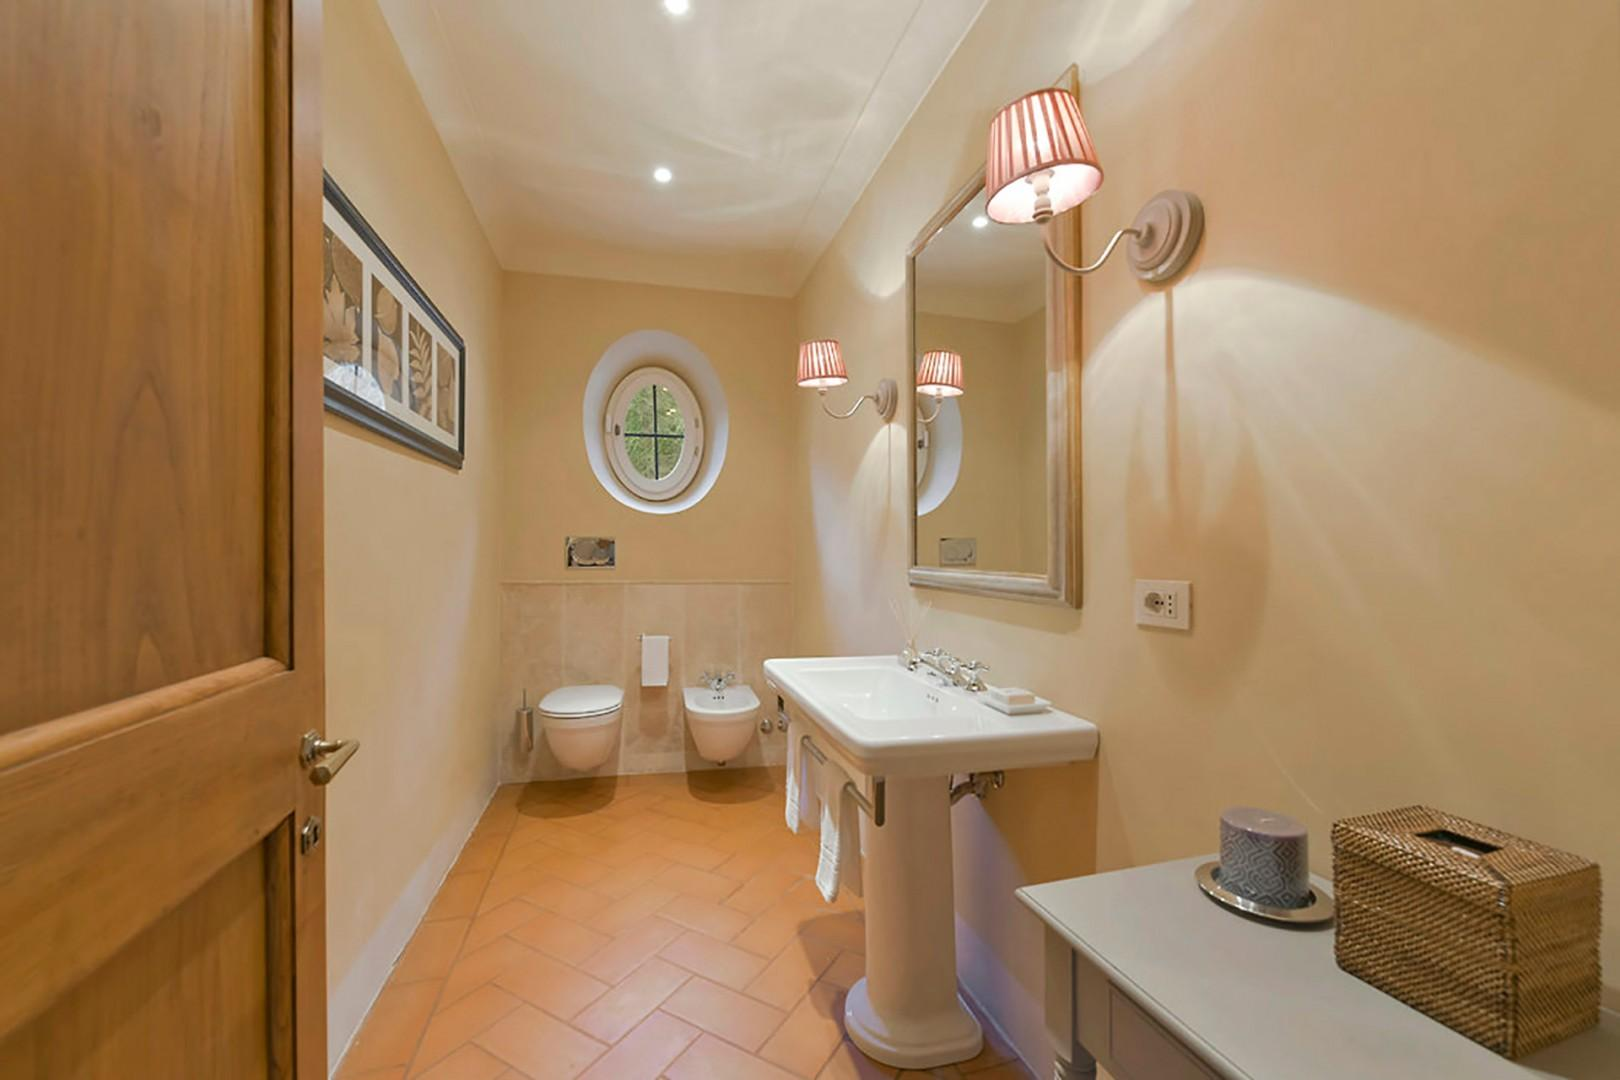 Half-bath on ground floor.